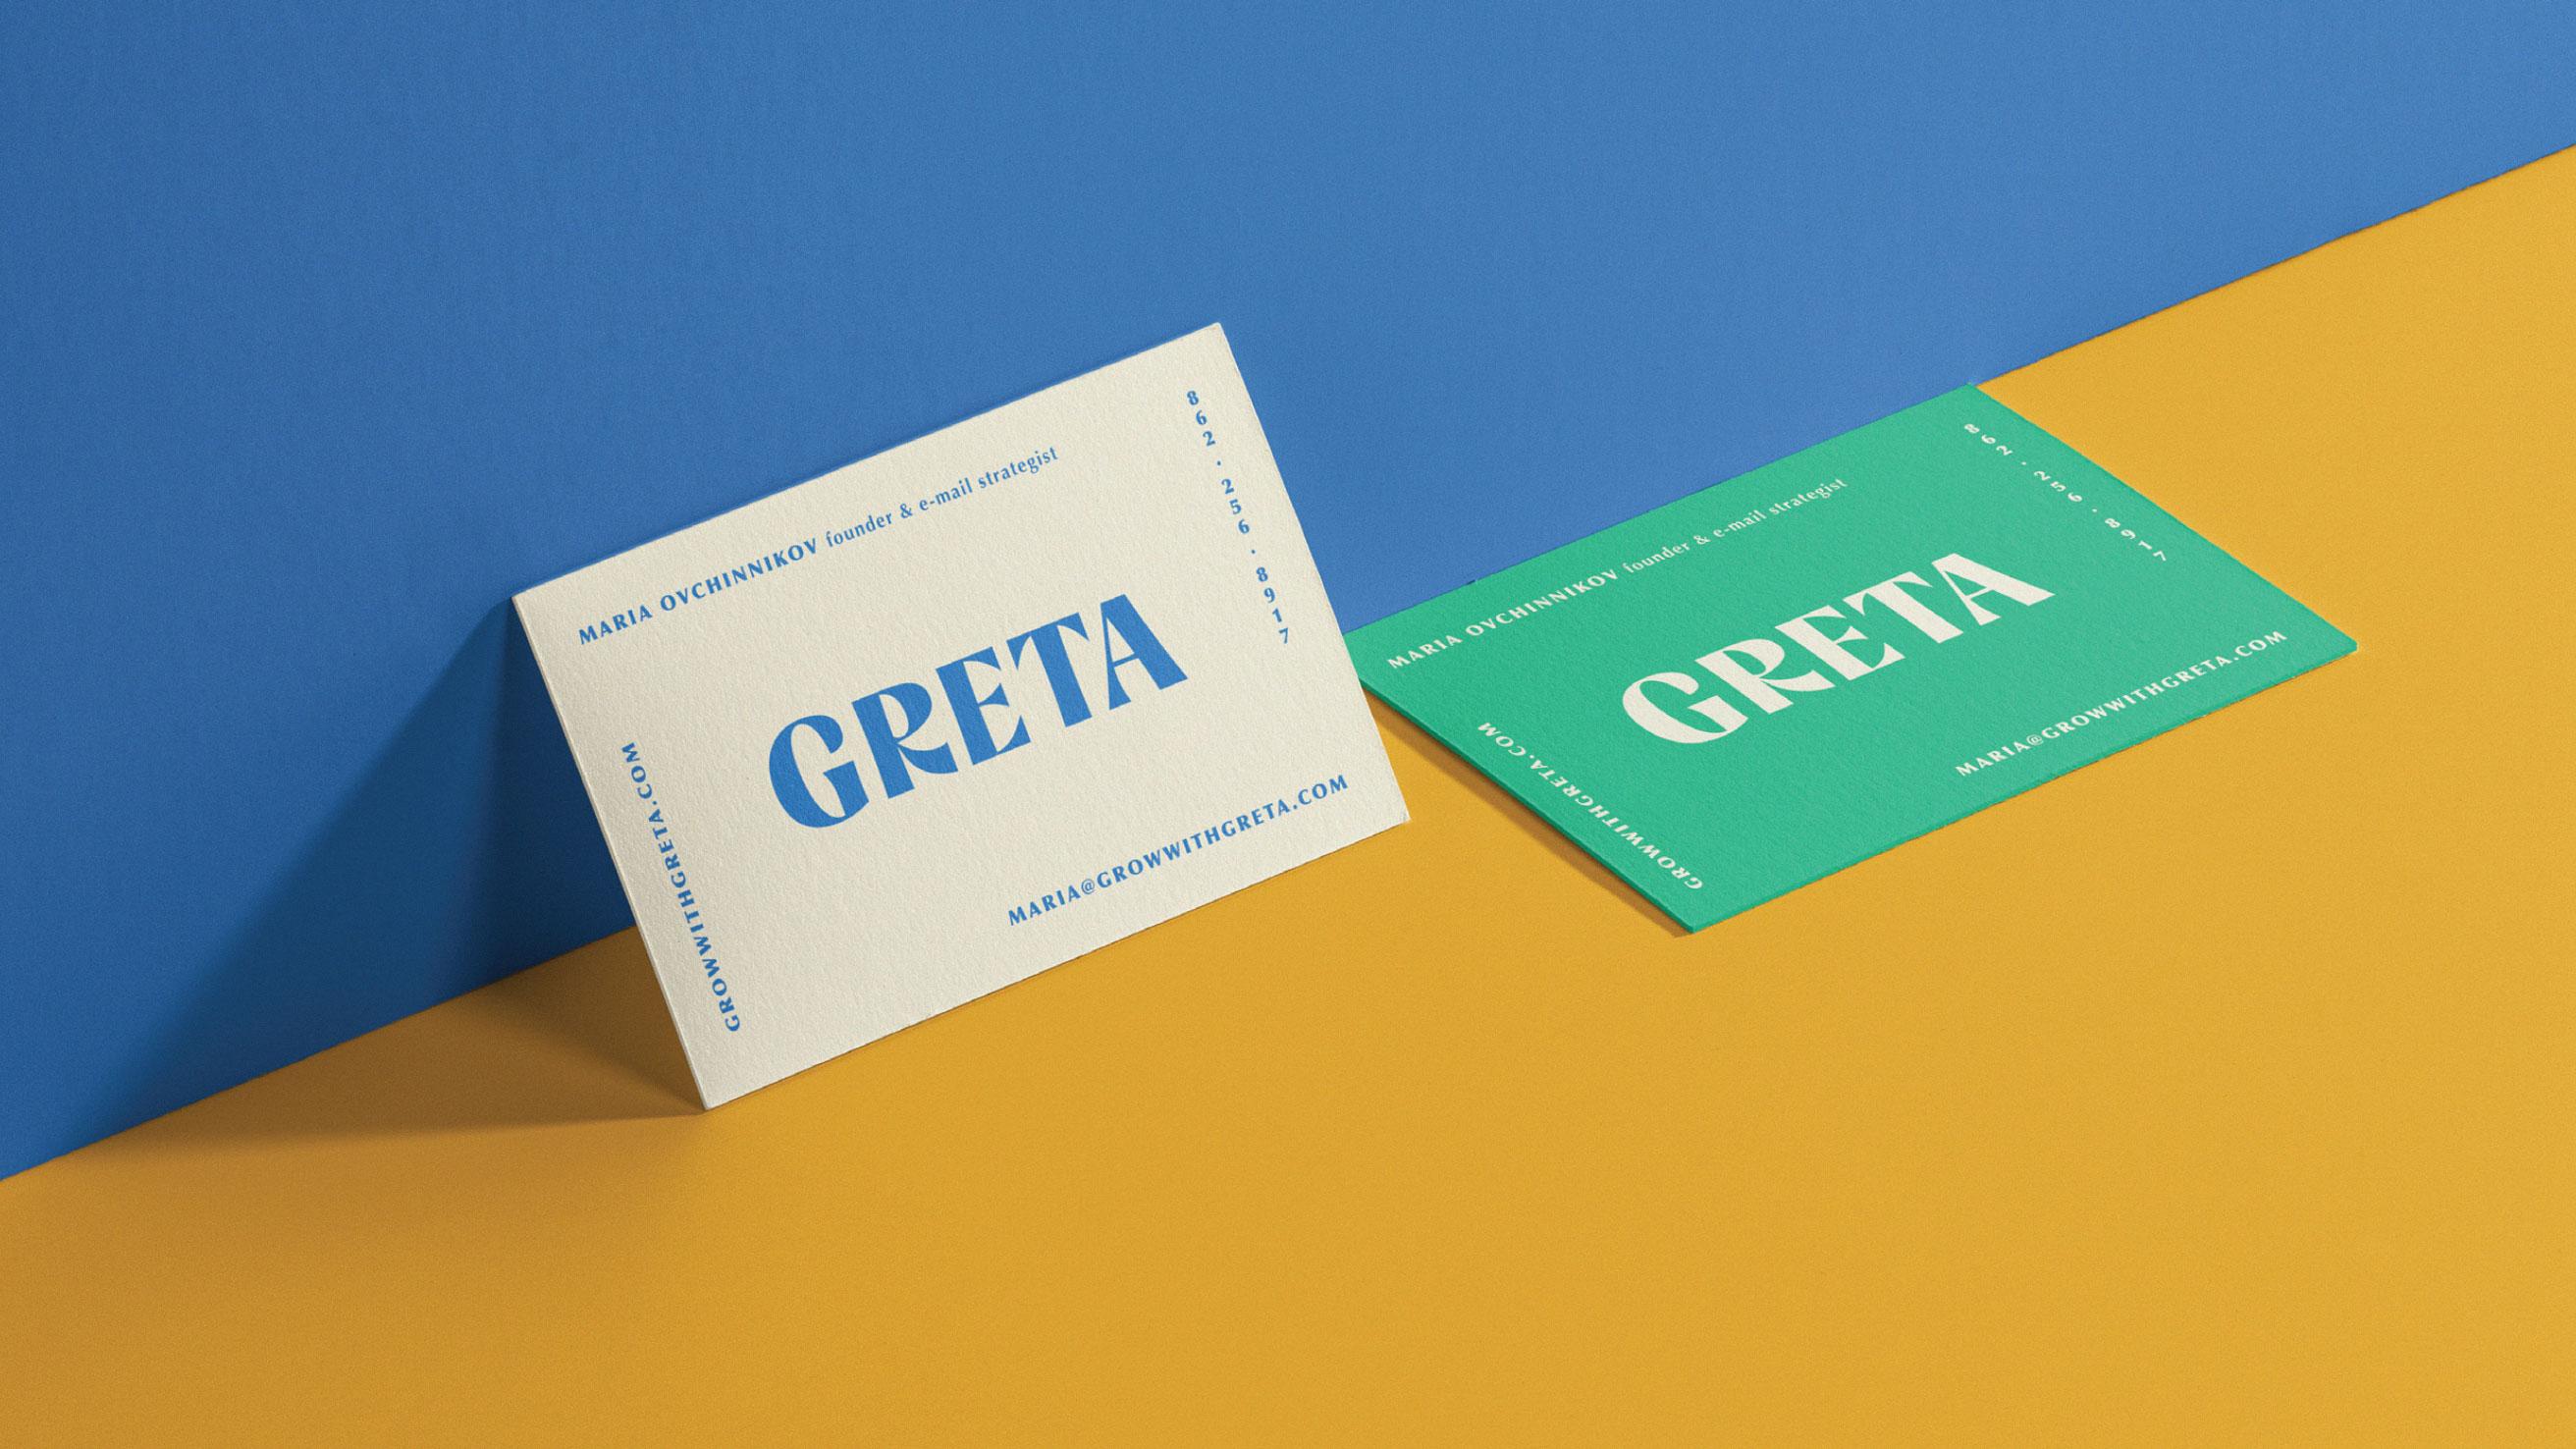 MGS_Greta_006